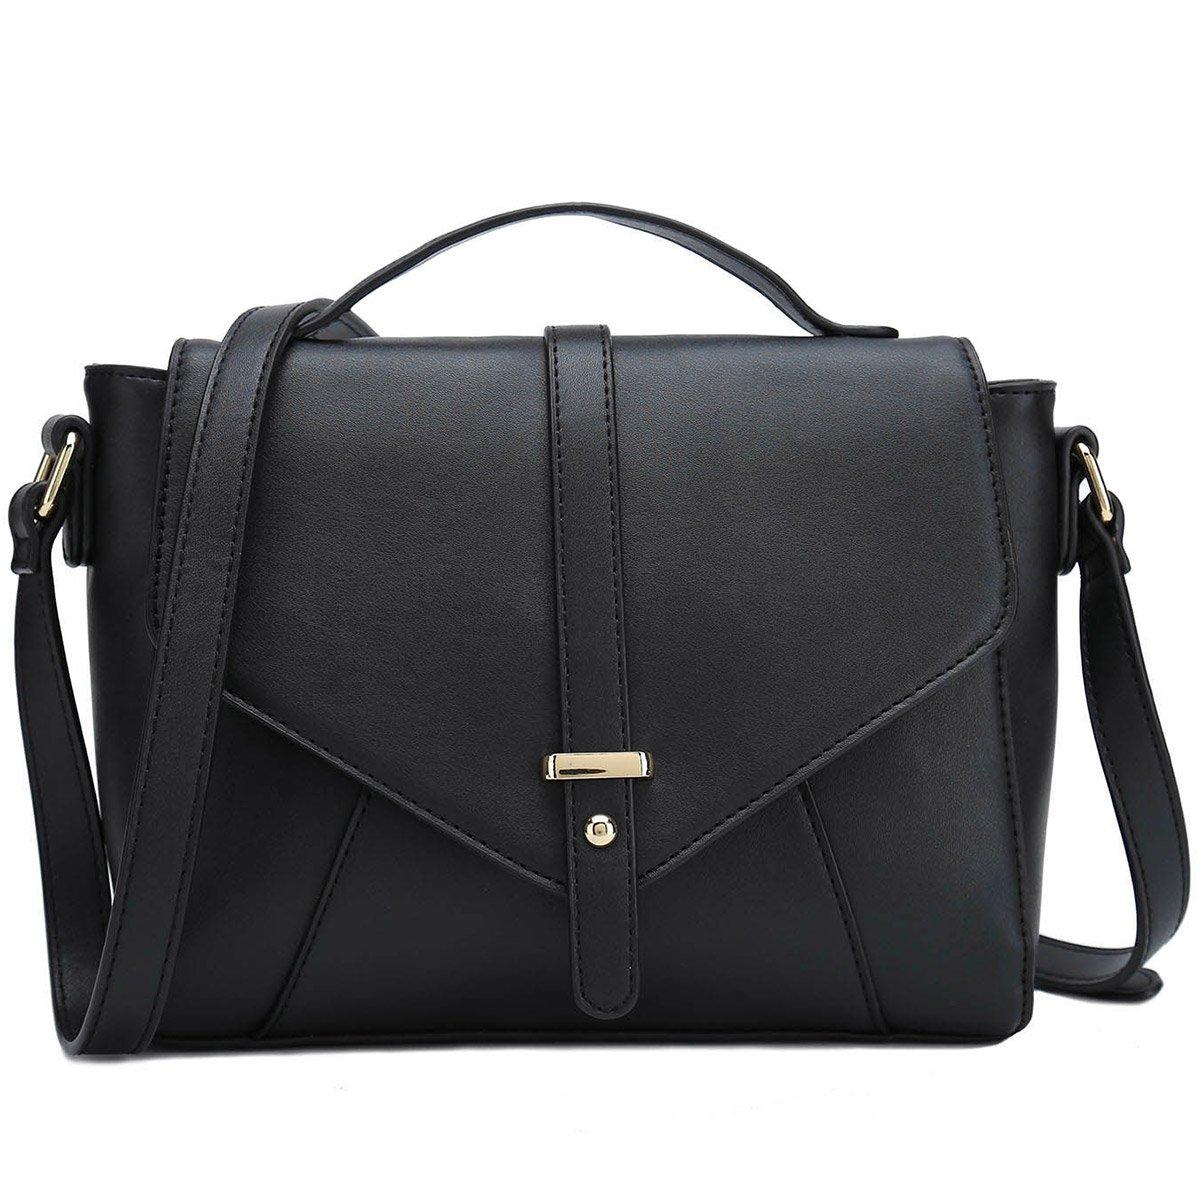 Ladies Designer Purses Cross Body Handbags Trendy Bags for Women Shoulder Bags (Black)